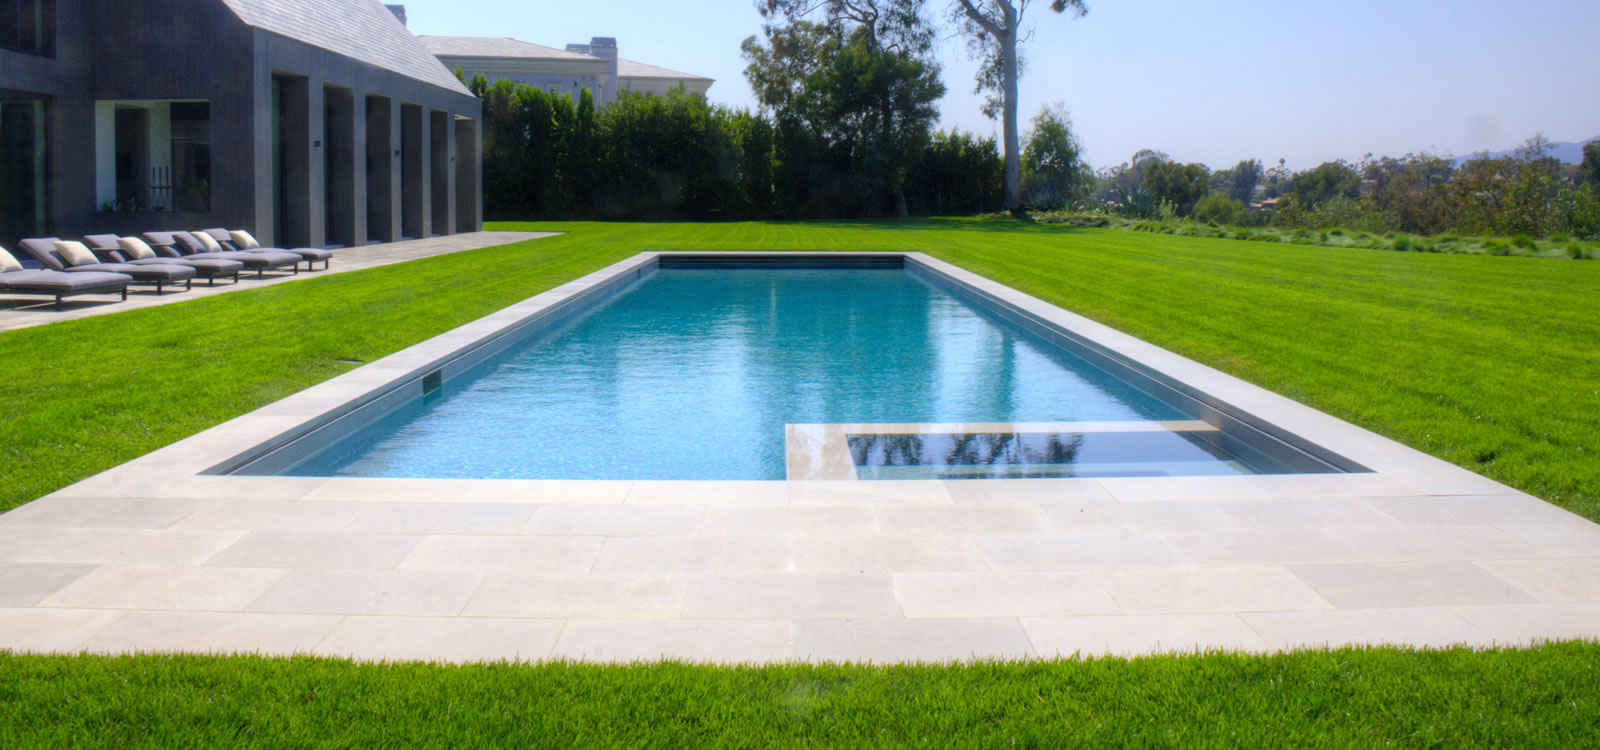 Santa Monica Pool & Spa Design w/ Pool Cover by John Crystal ...